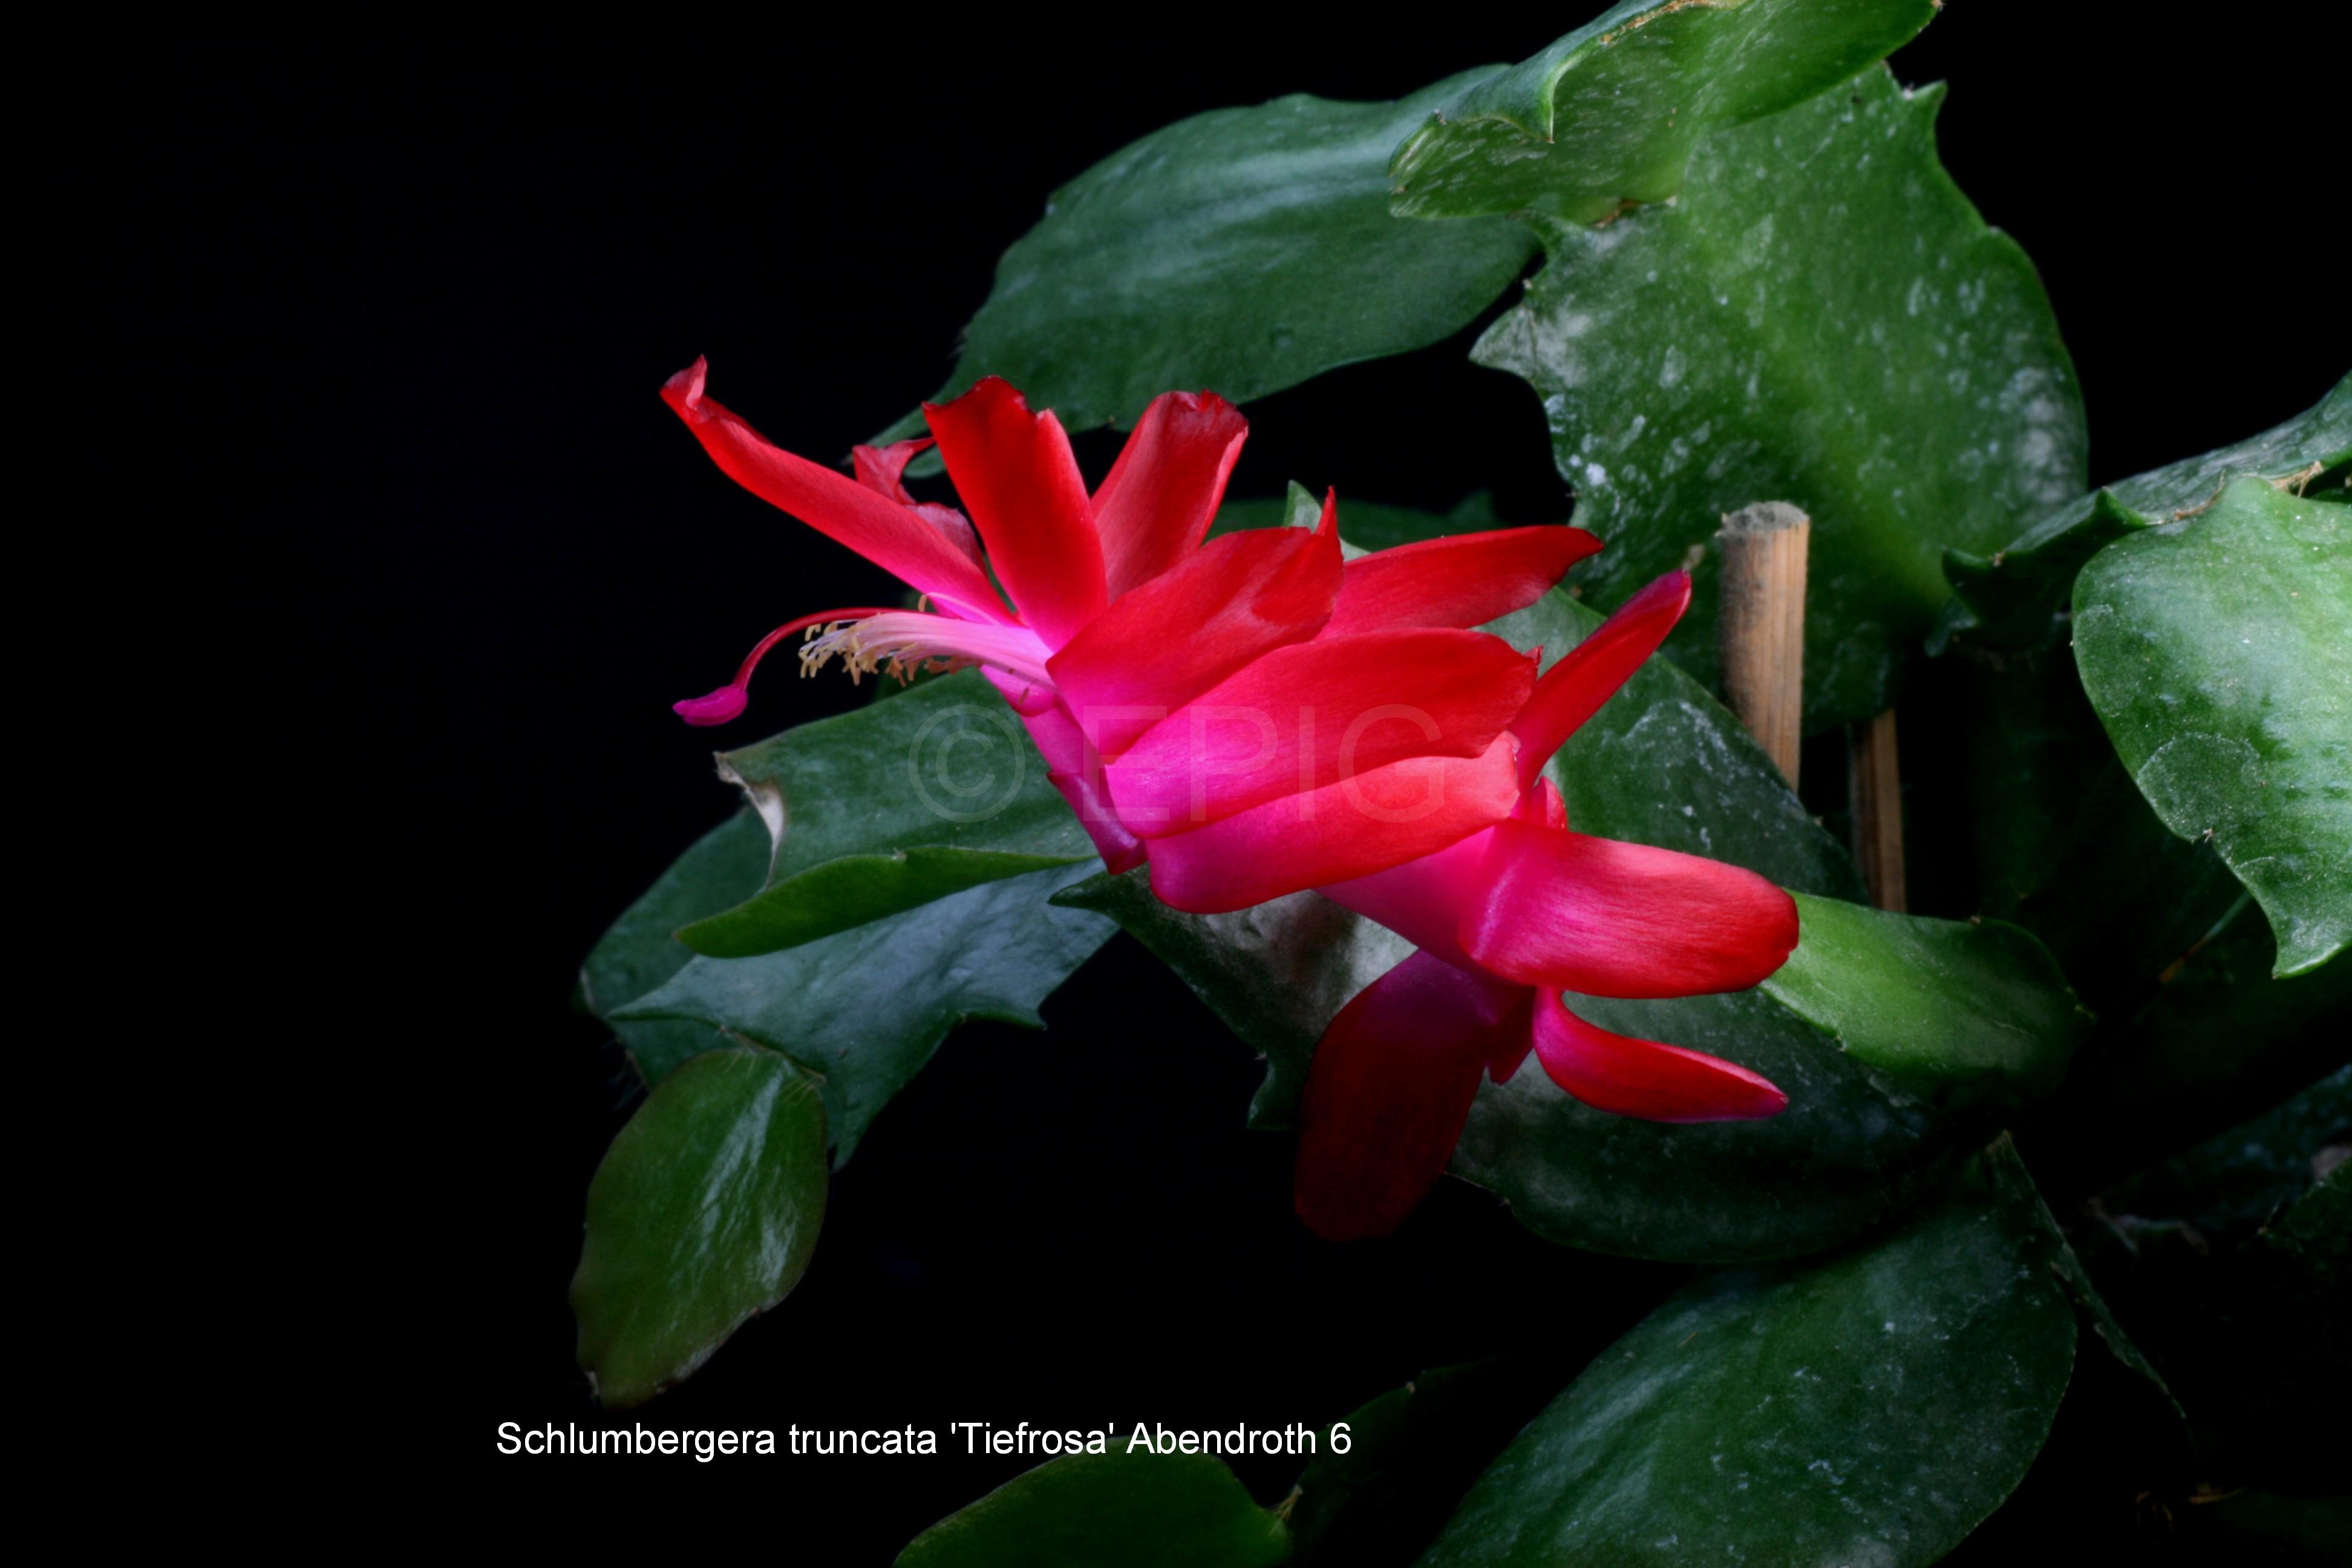 Schlumbergera truncata 'tiefrosa' Abendroth 6 (Foto Jochen Bockemühl)